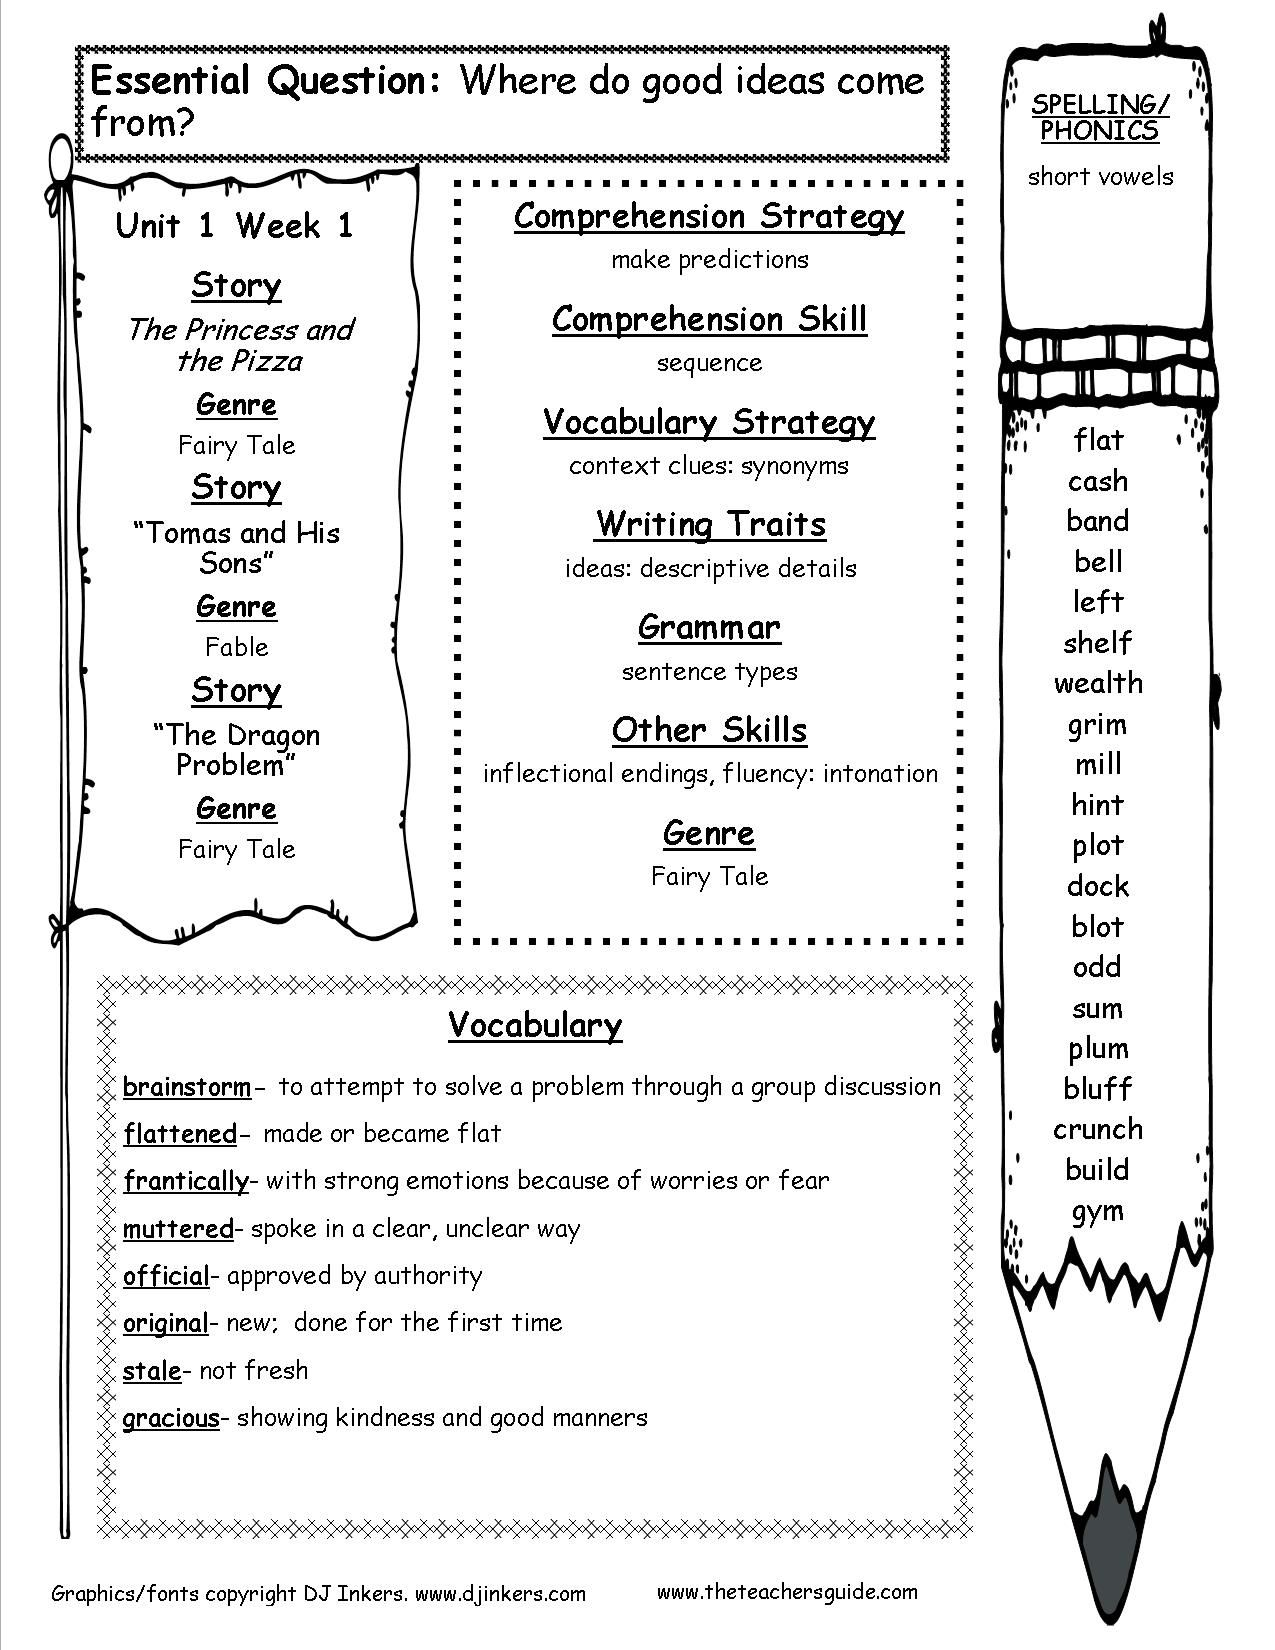 Mhschool spelling pdf 4th grade